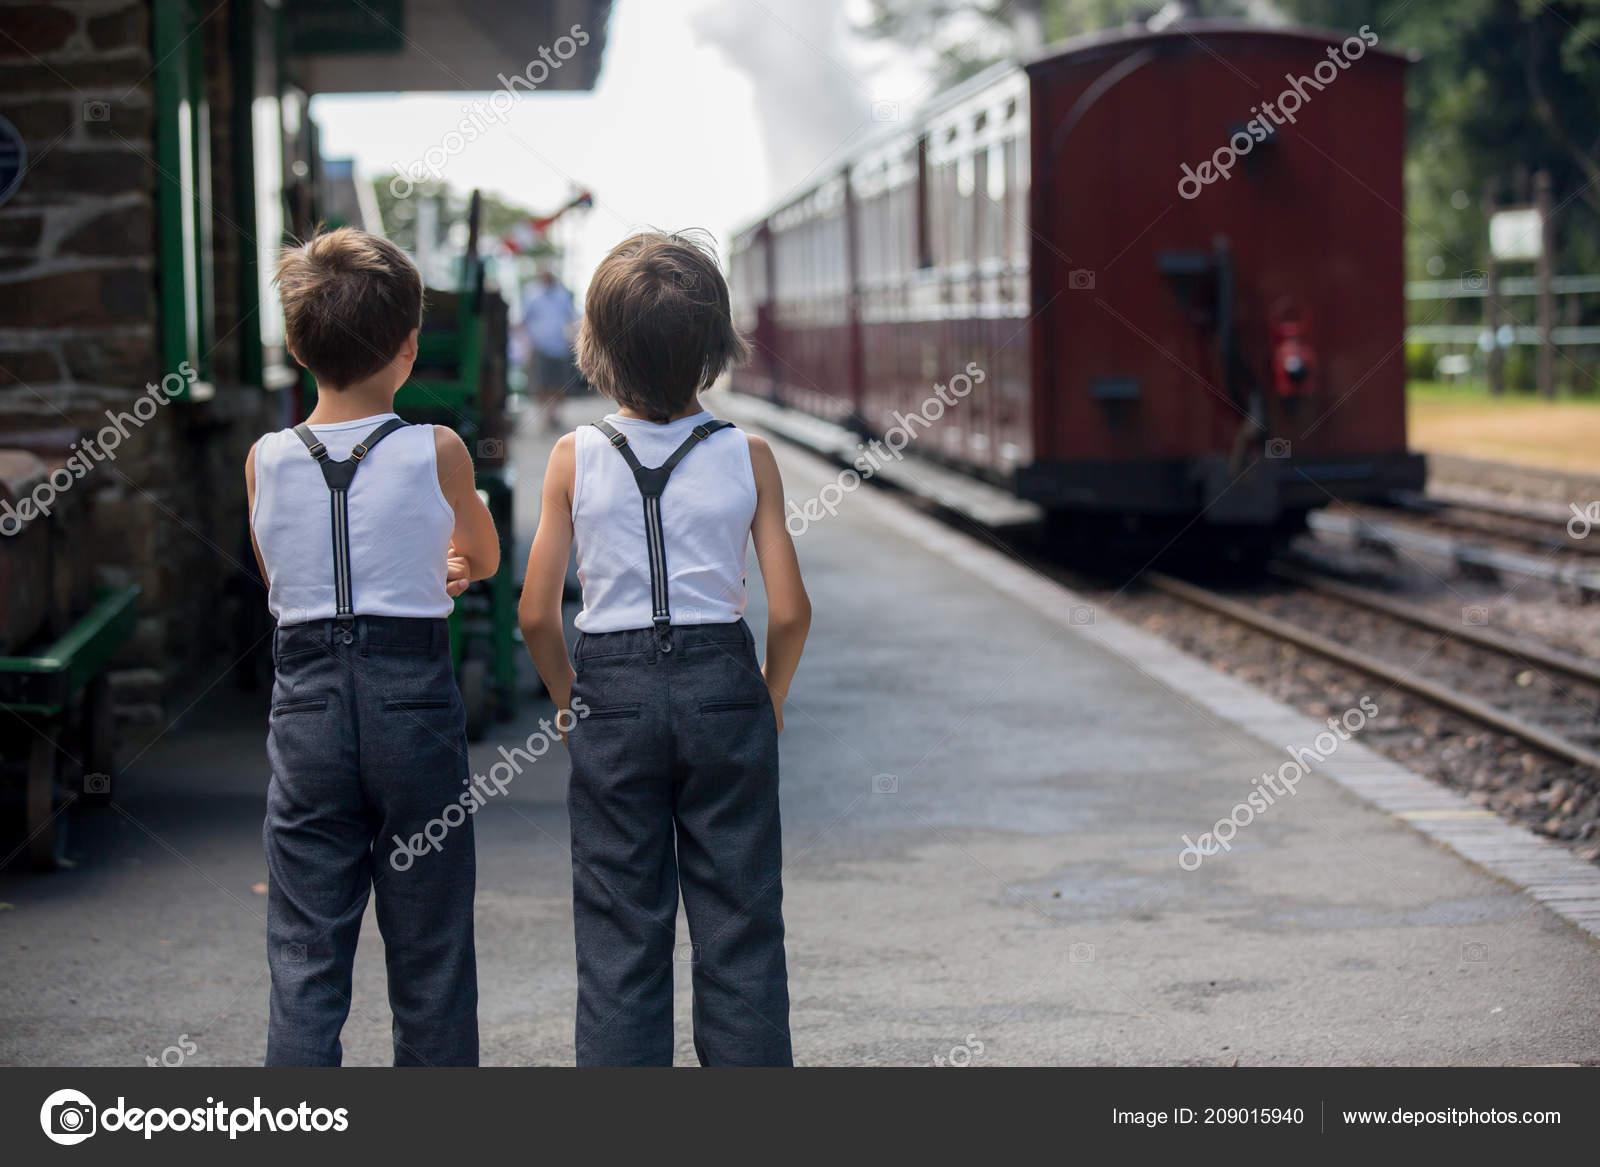 5ab9dab519a2 Όμορφα παιδιά, ντυμένοι με ρούχα vintage, απολαμβάνοντας το παλιό  ατμοκίνητο τρένο μια καυτή θερινή ημέρα στην Αγγλία — Εικόνα από  t.tomsickova